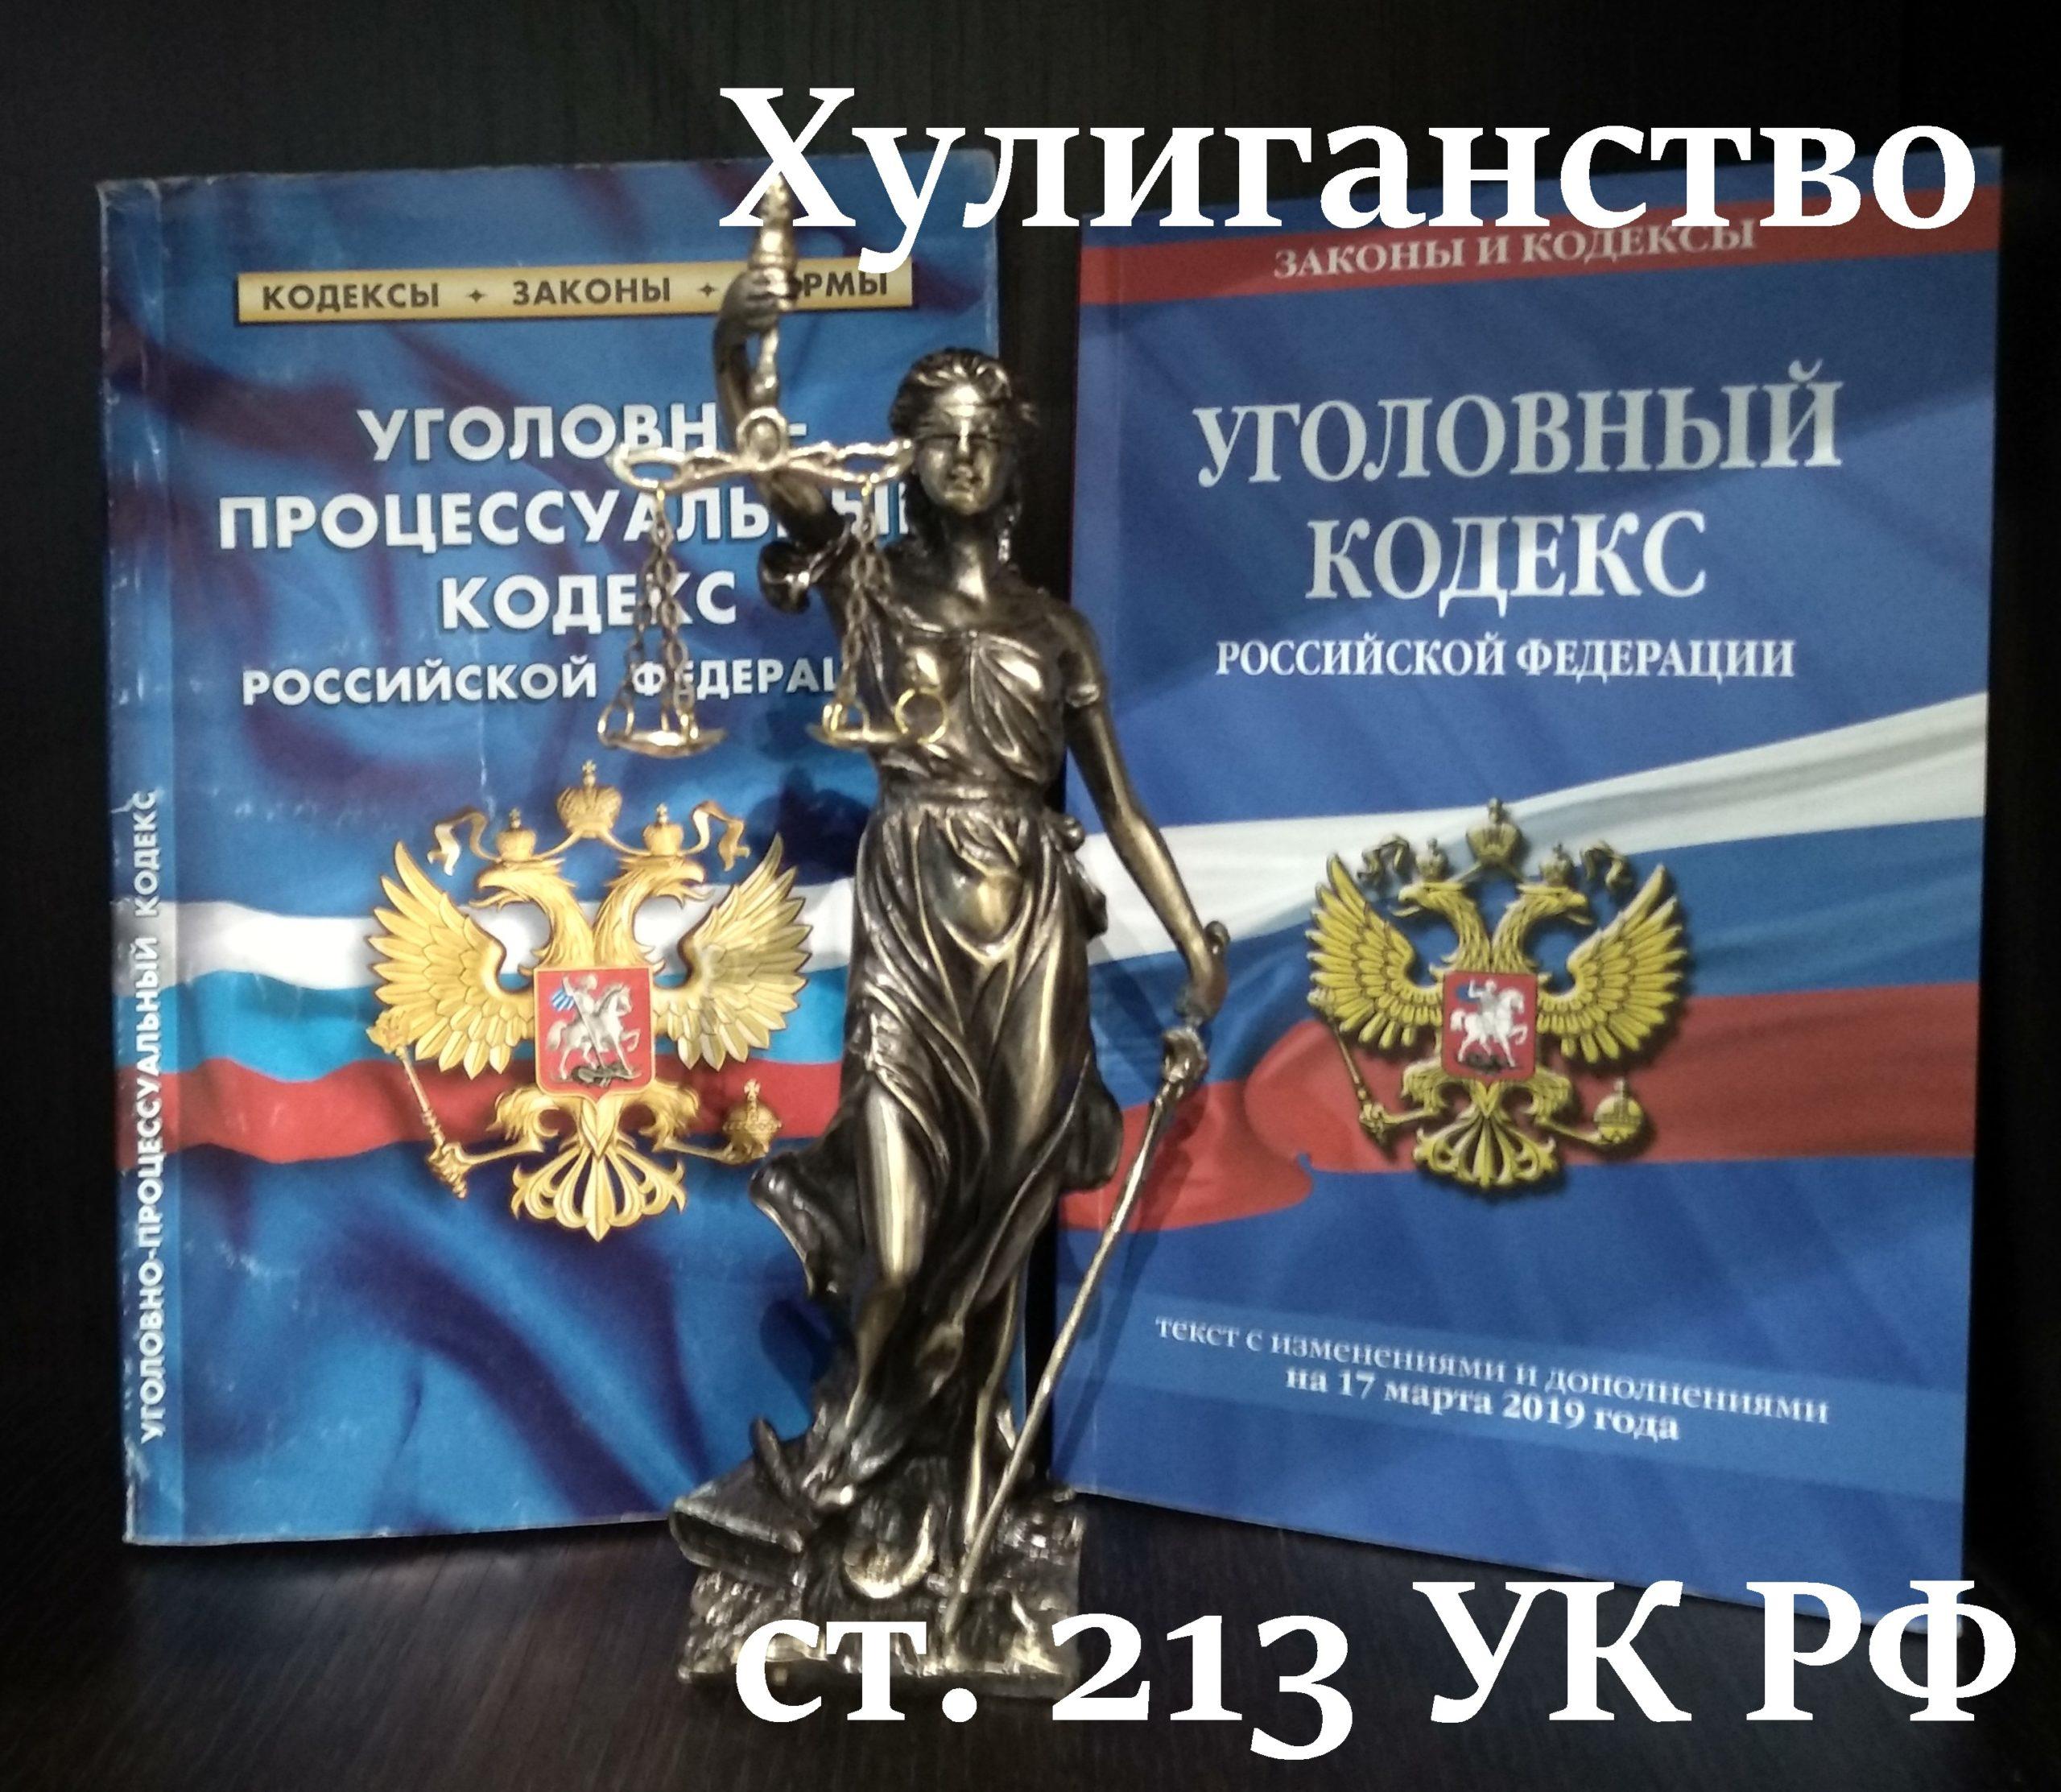 Адвокат по ст. 213 УК РФ Хулиганство